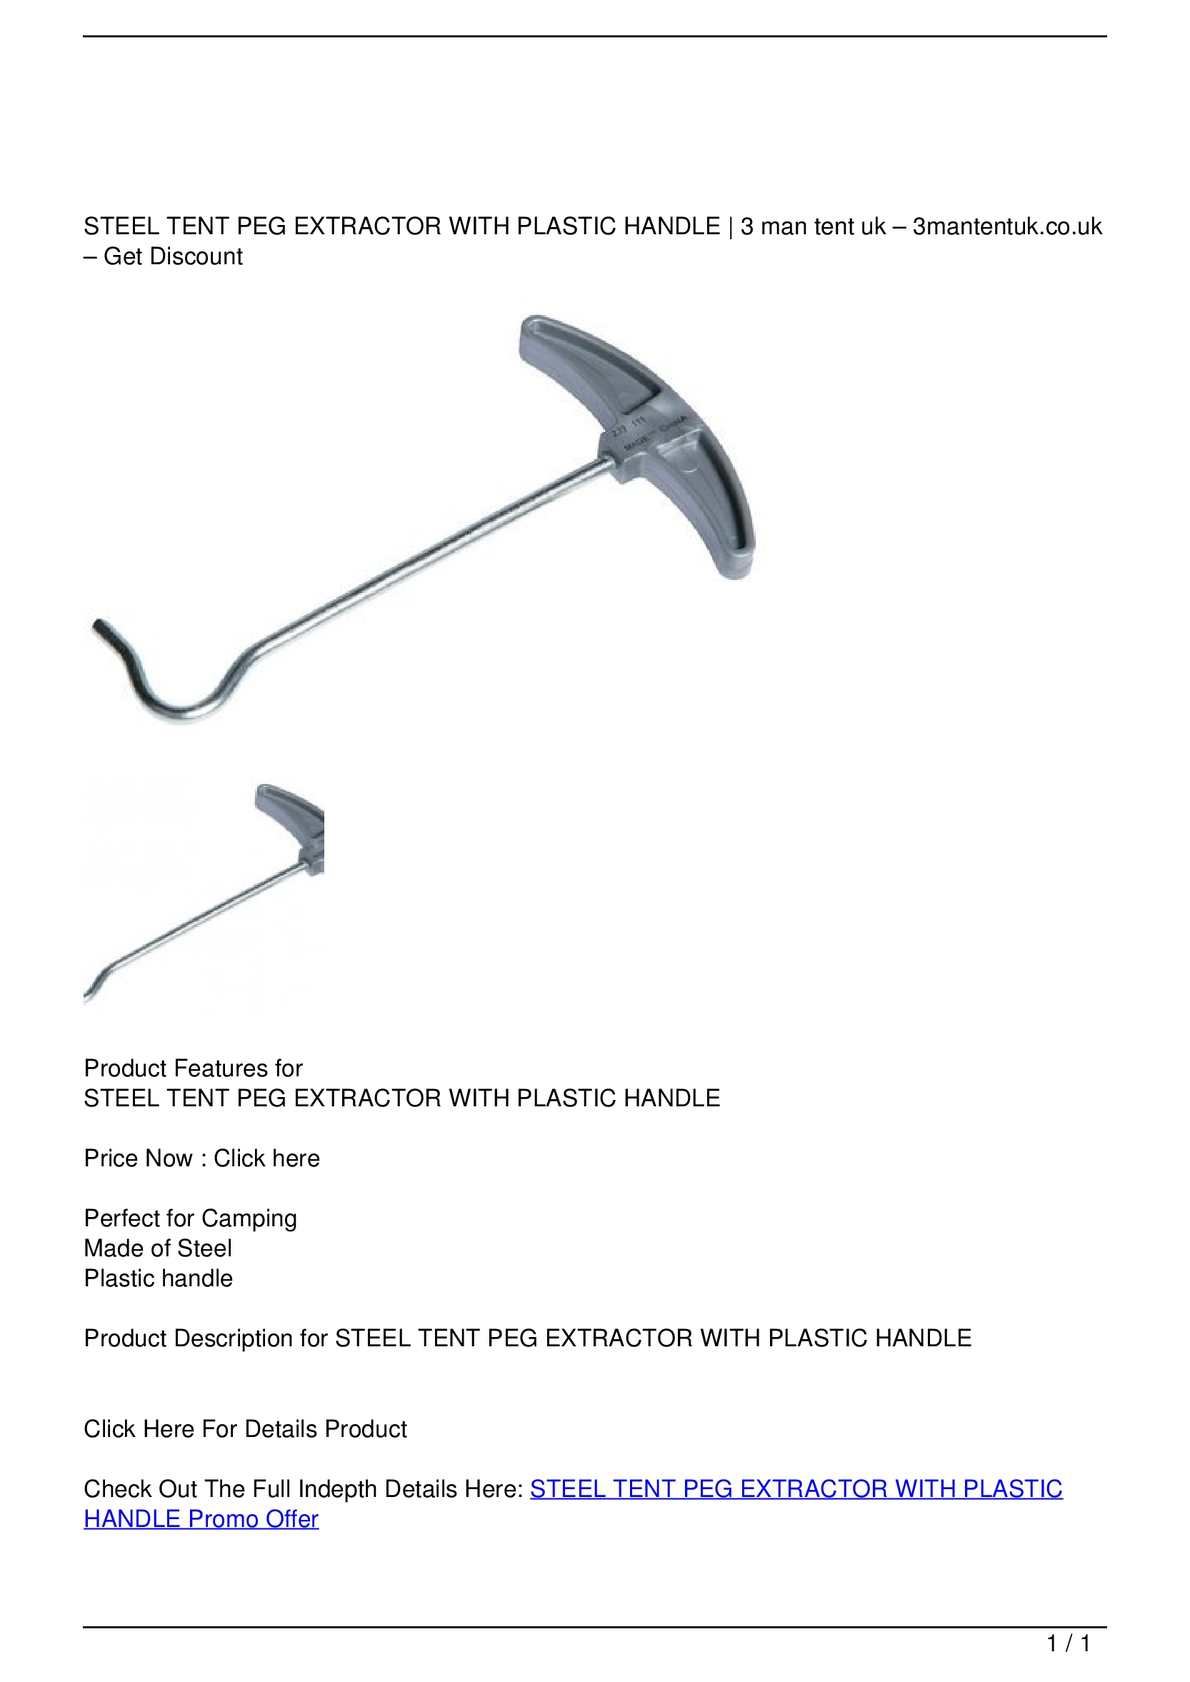 STEEL TENT PEG EXTRACTOR WITH PLASTIC HANDLE